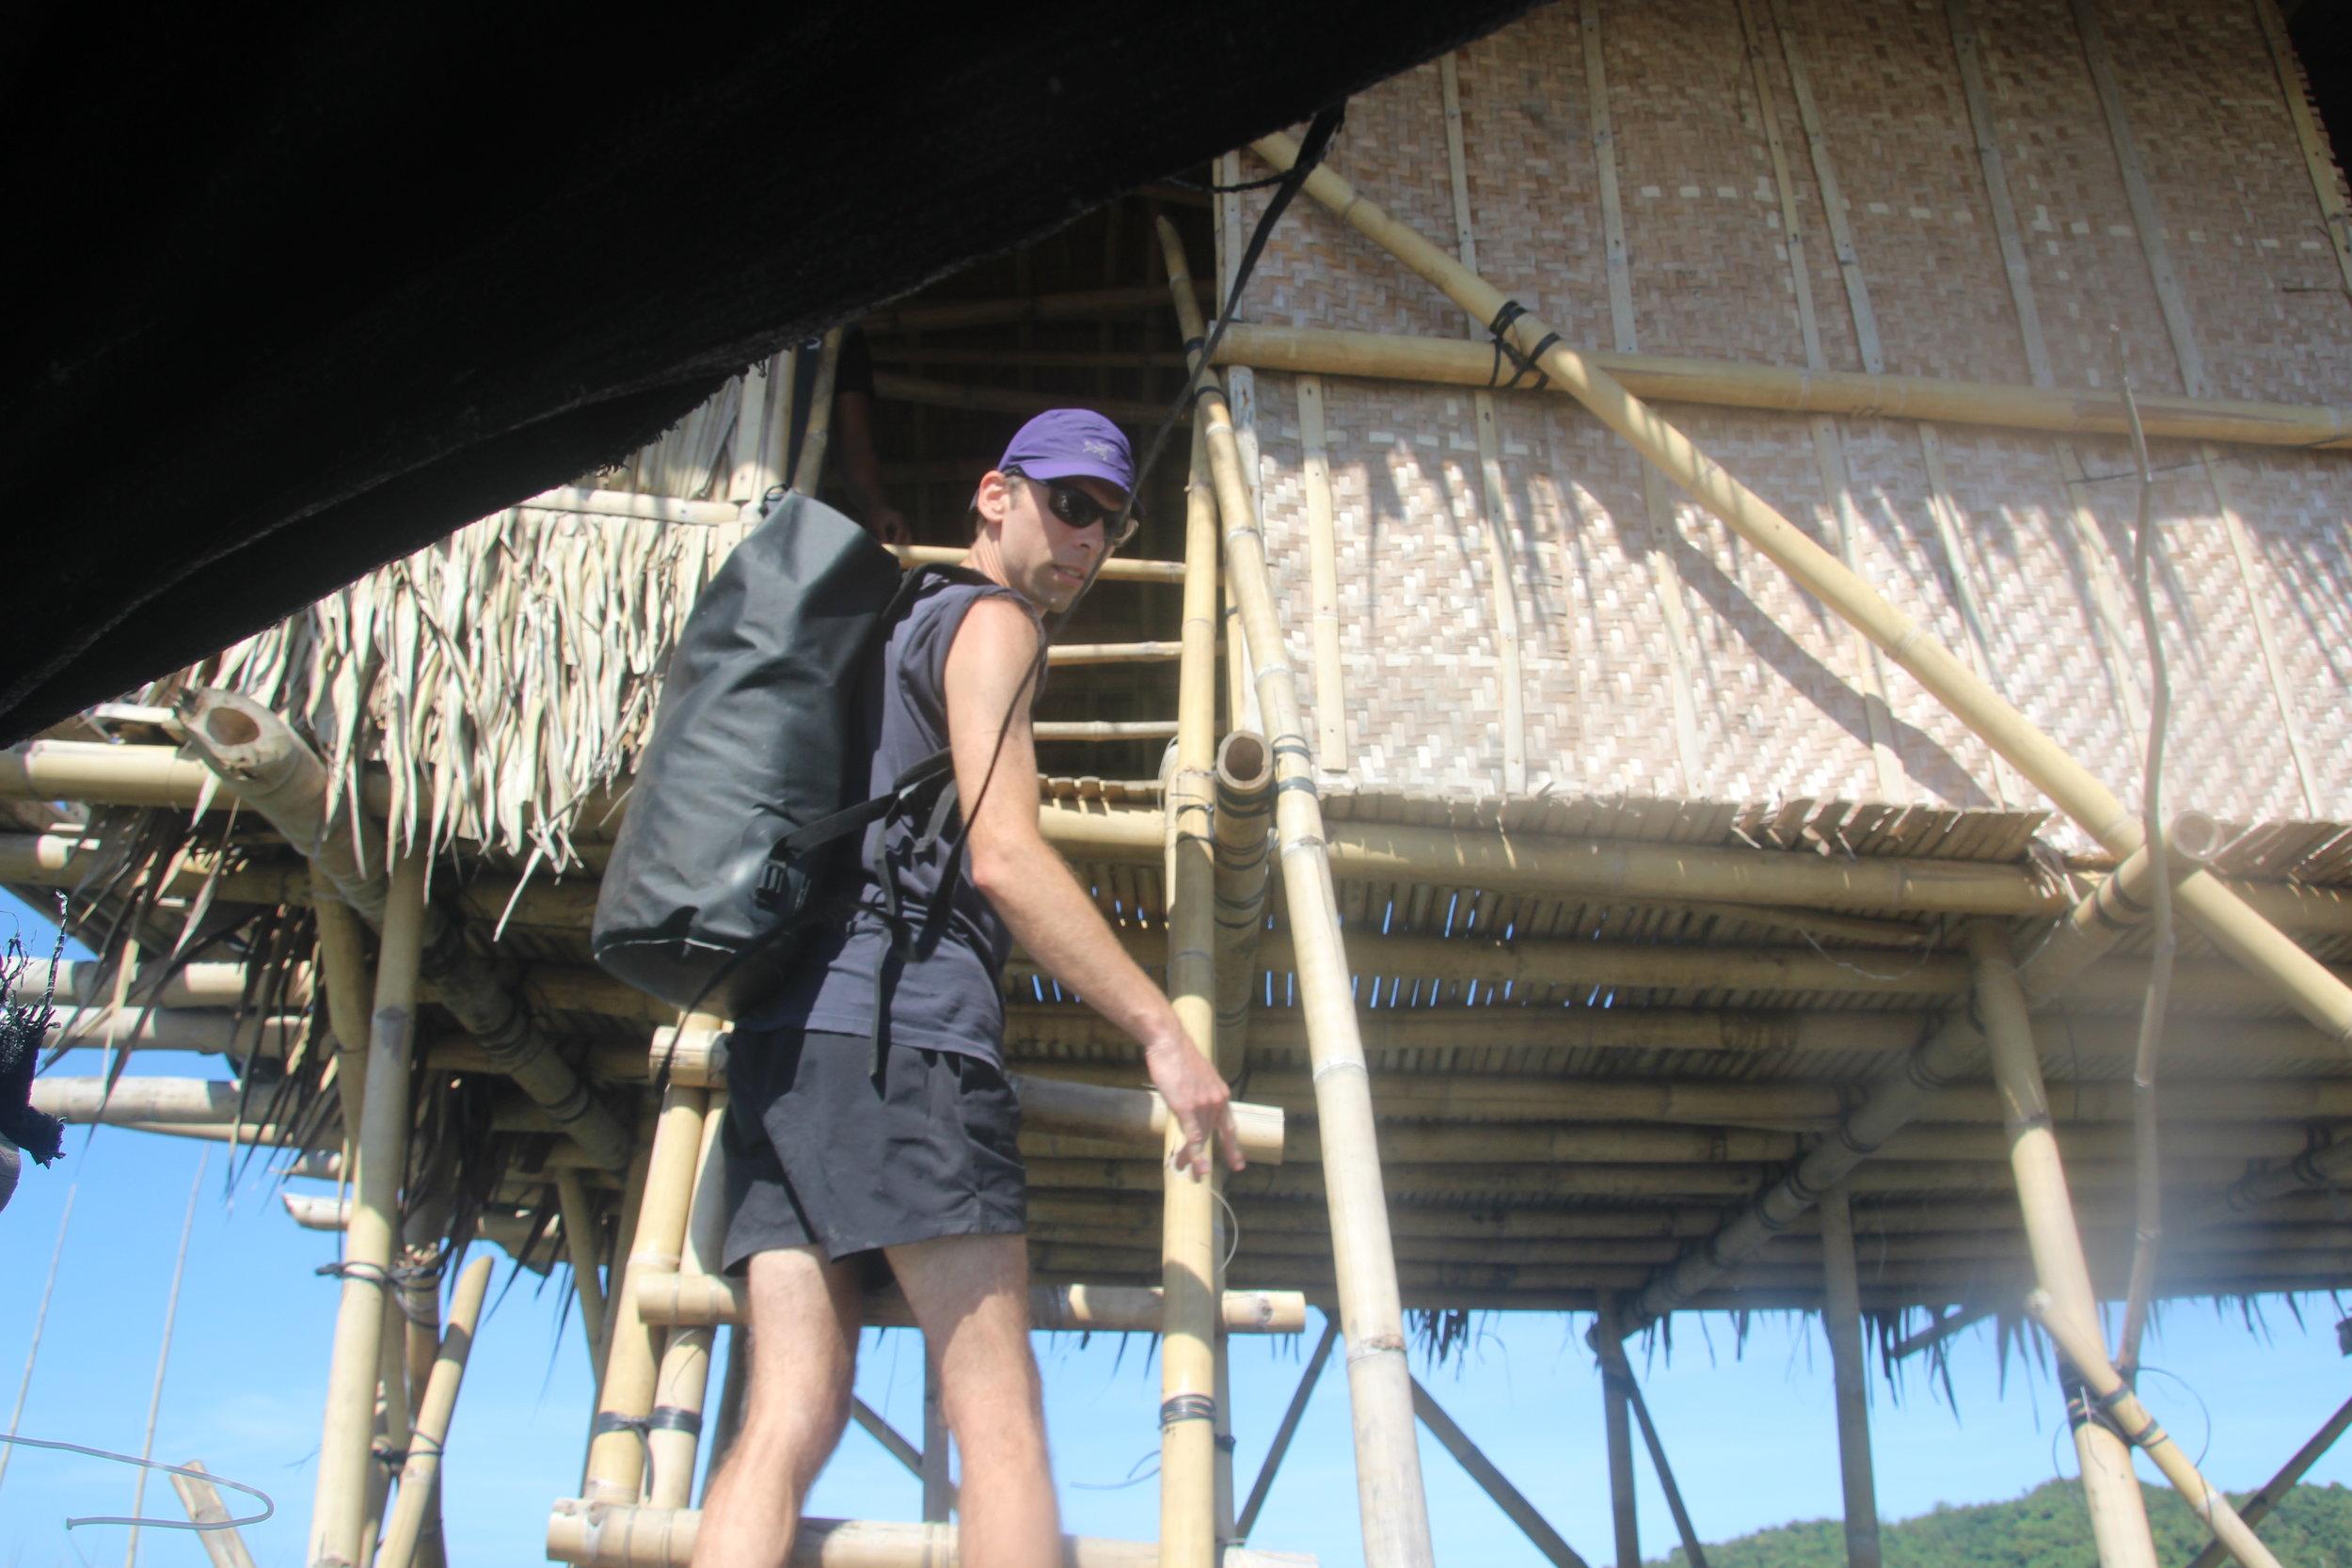 TinagongDagatIMG_8633.JPG